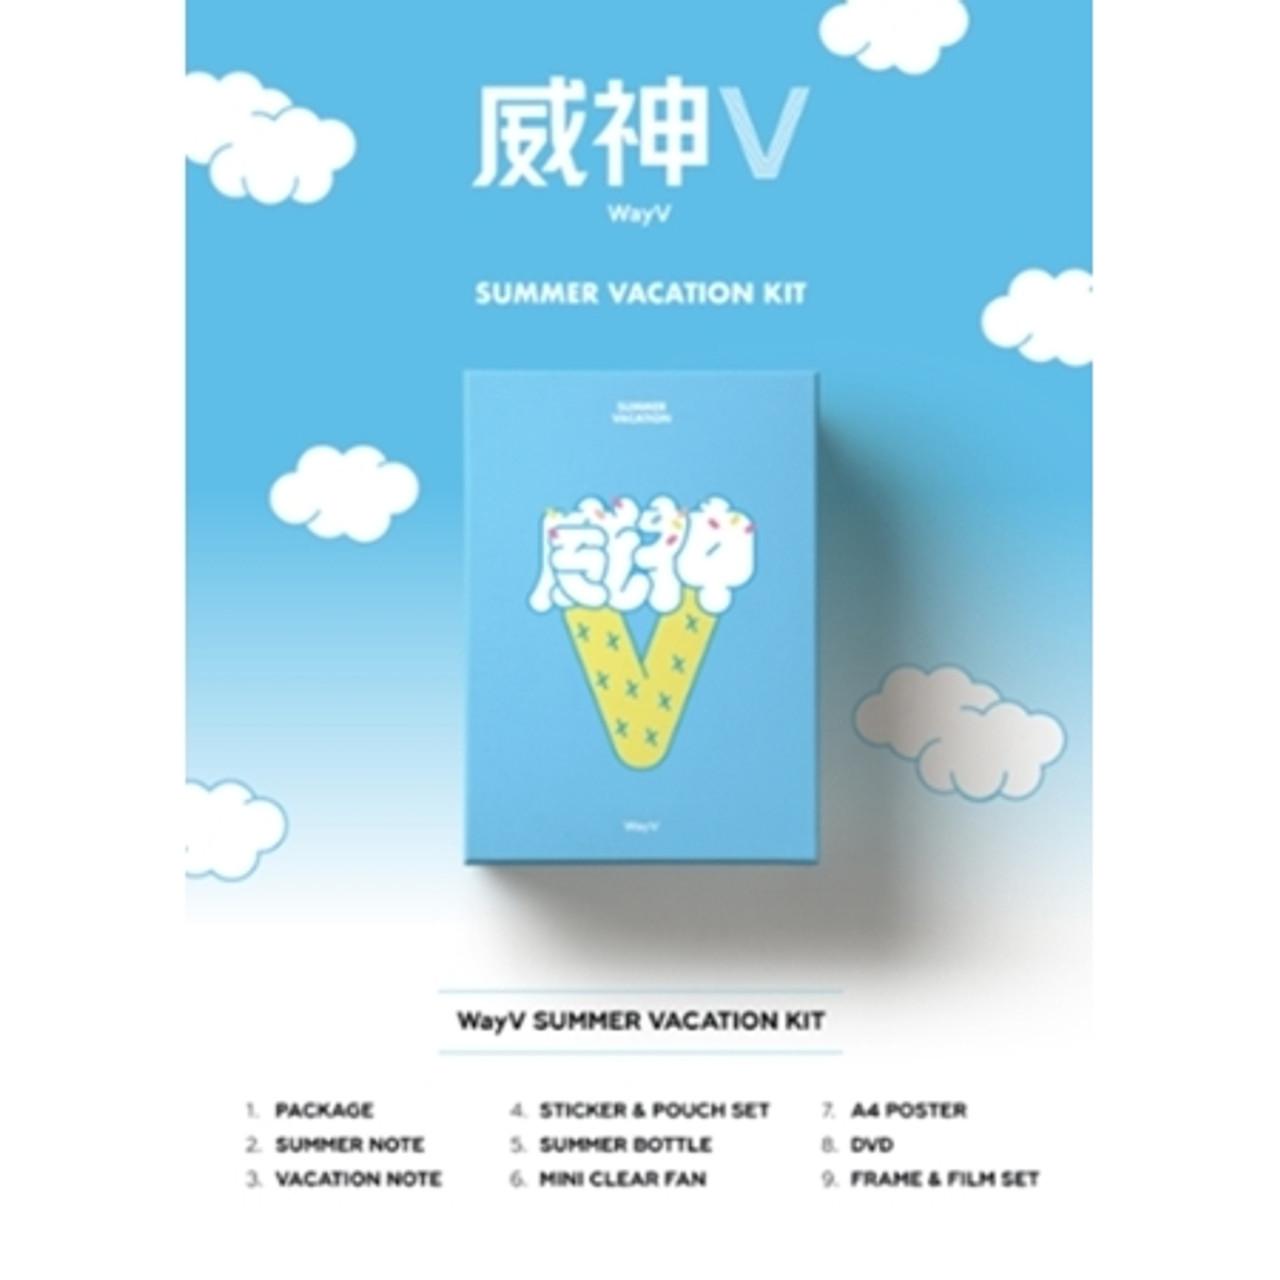 WayV - 2019 WayV SUMMER VACATION KIT